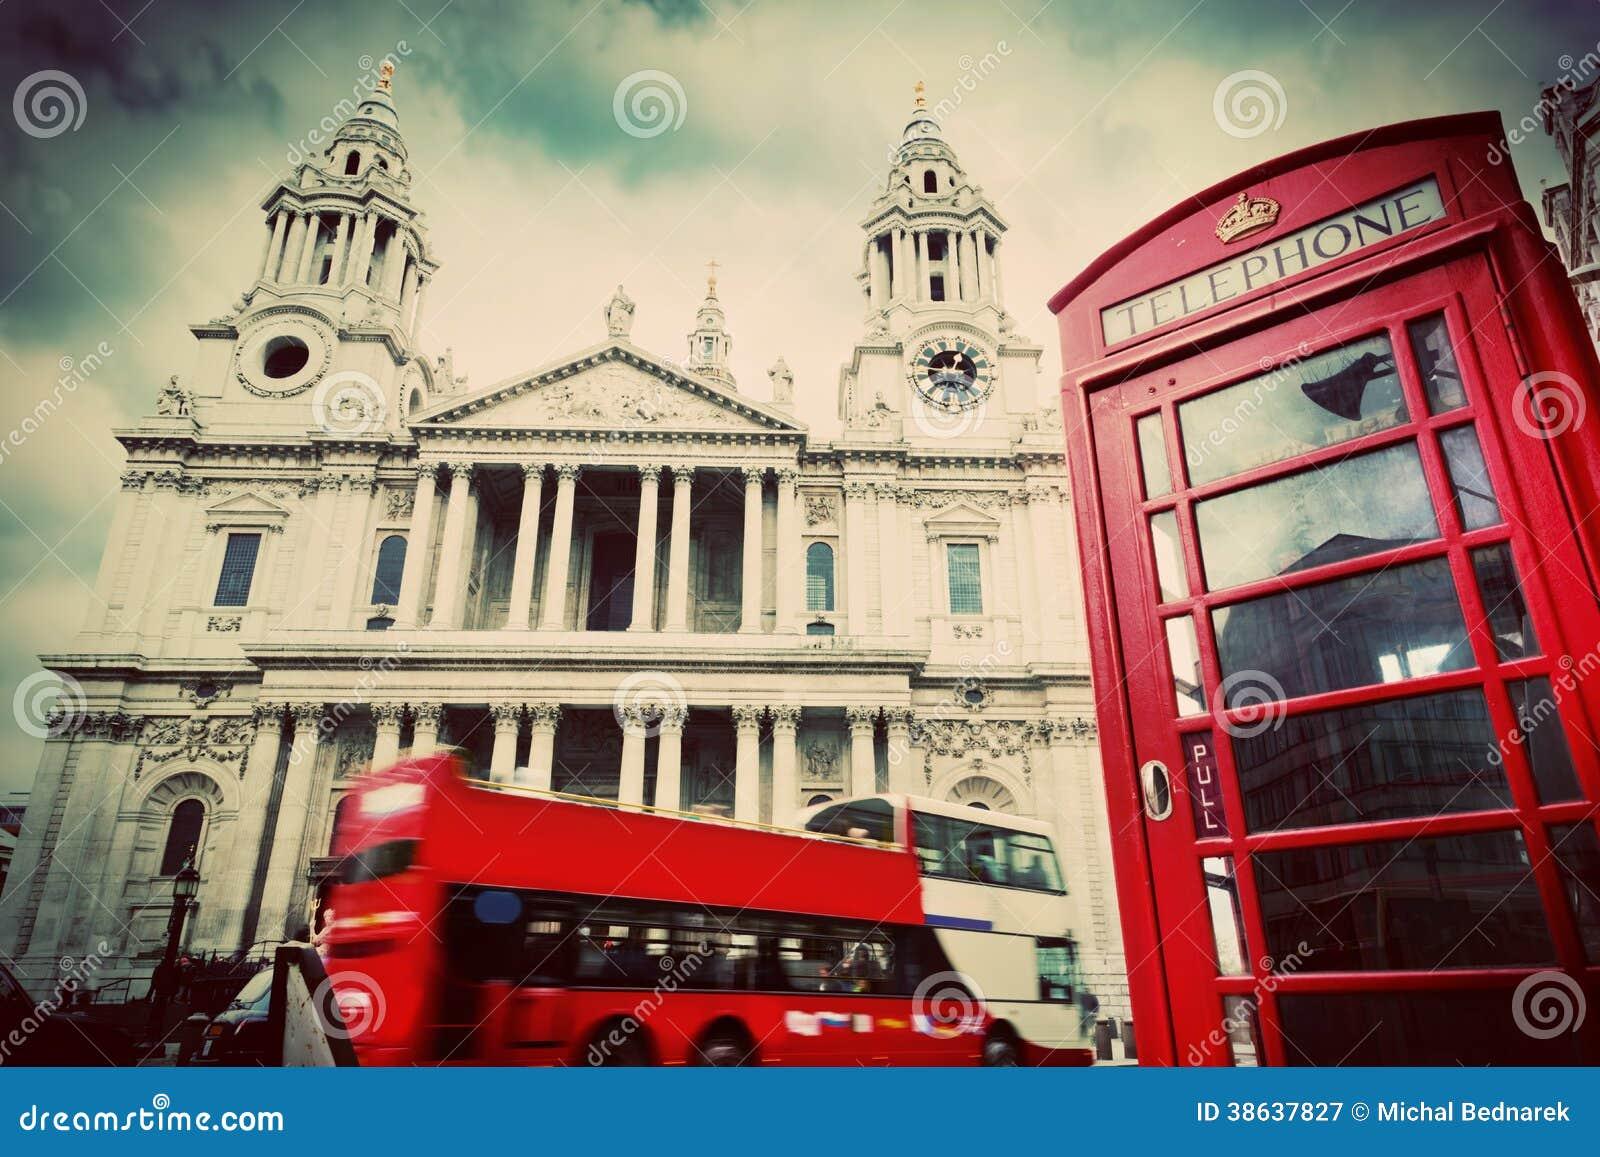 St Paul Kathedrale, roter Bus, Telefonzelle. London